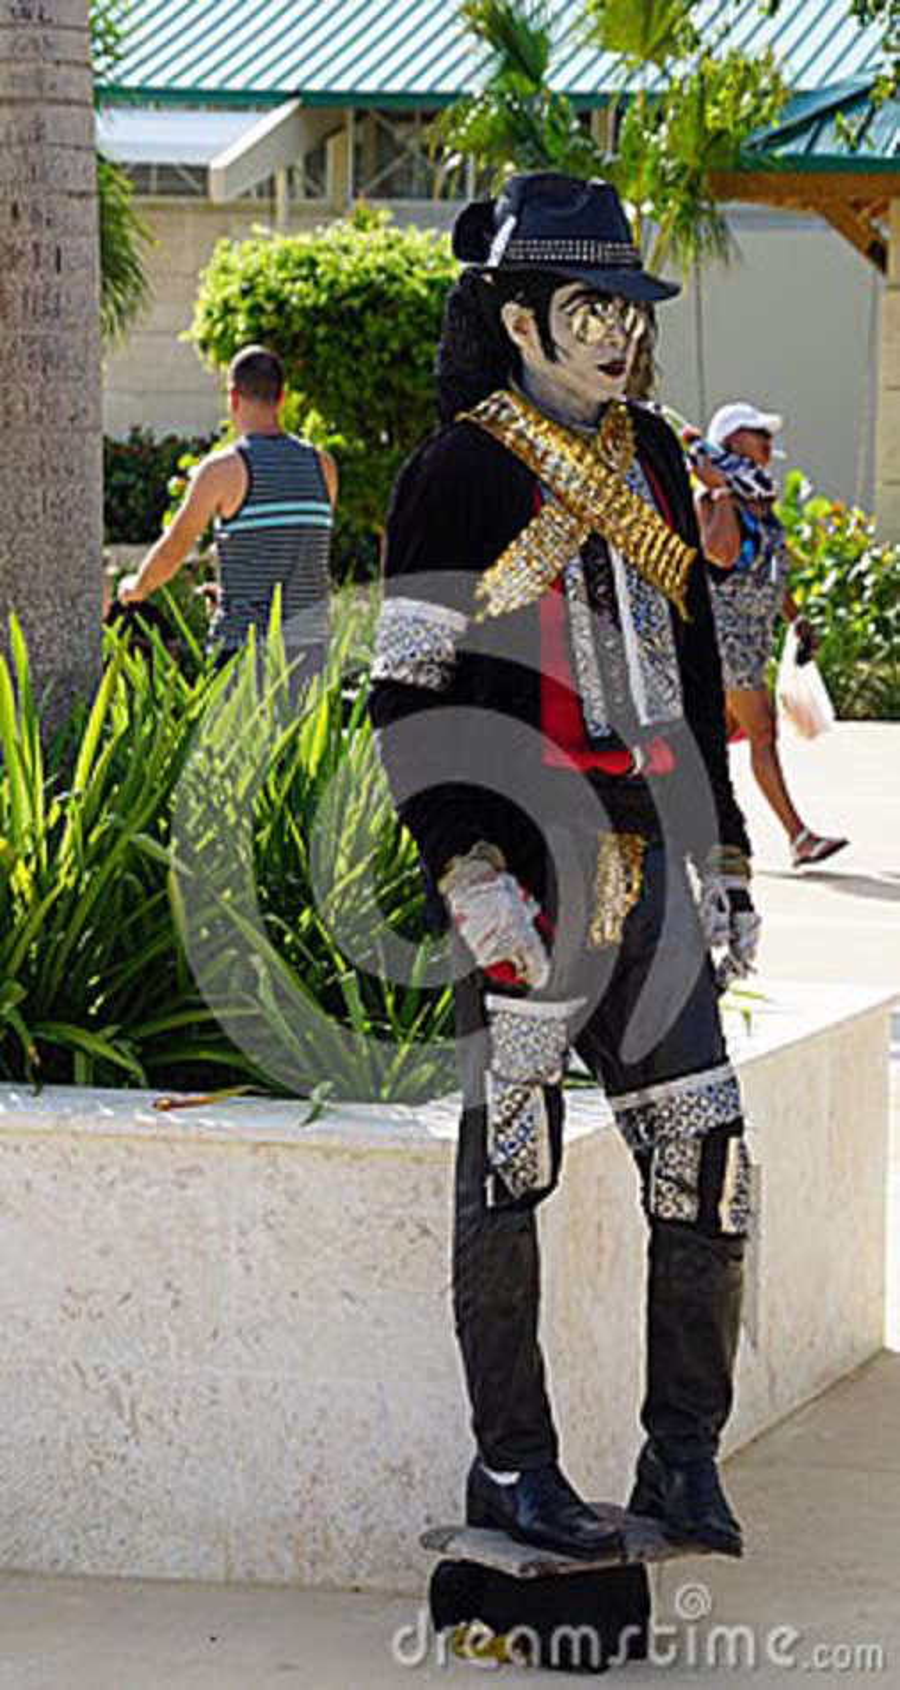 Imitador de Michael Jackson, La Romana, República Dominicana